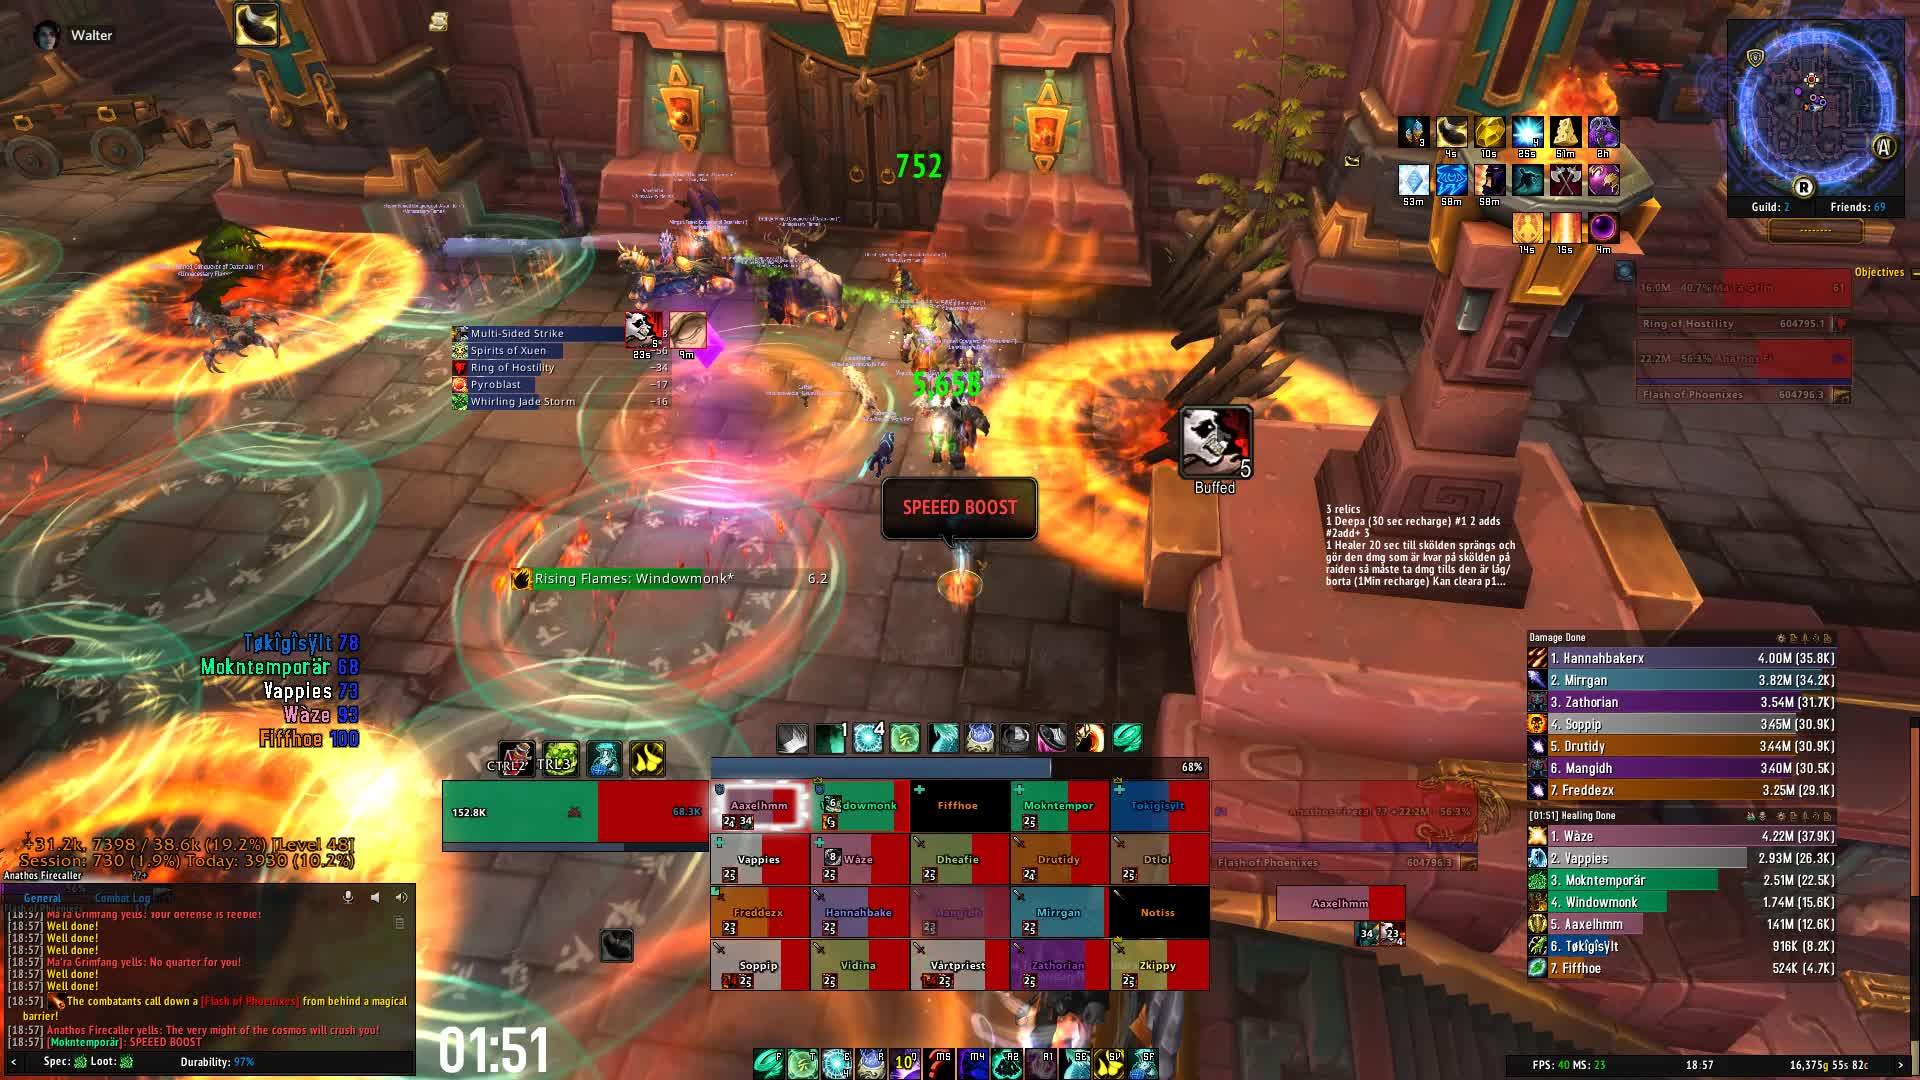 worldofwarcraft, World Of Warcraft 2019.04.17 - 18.57.40.02.DVR GIFs